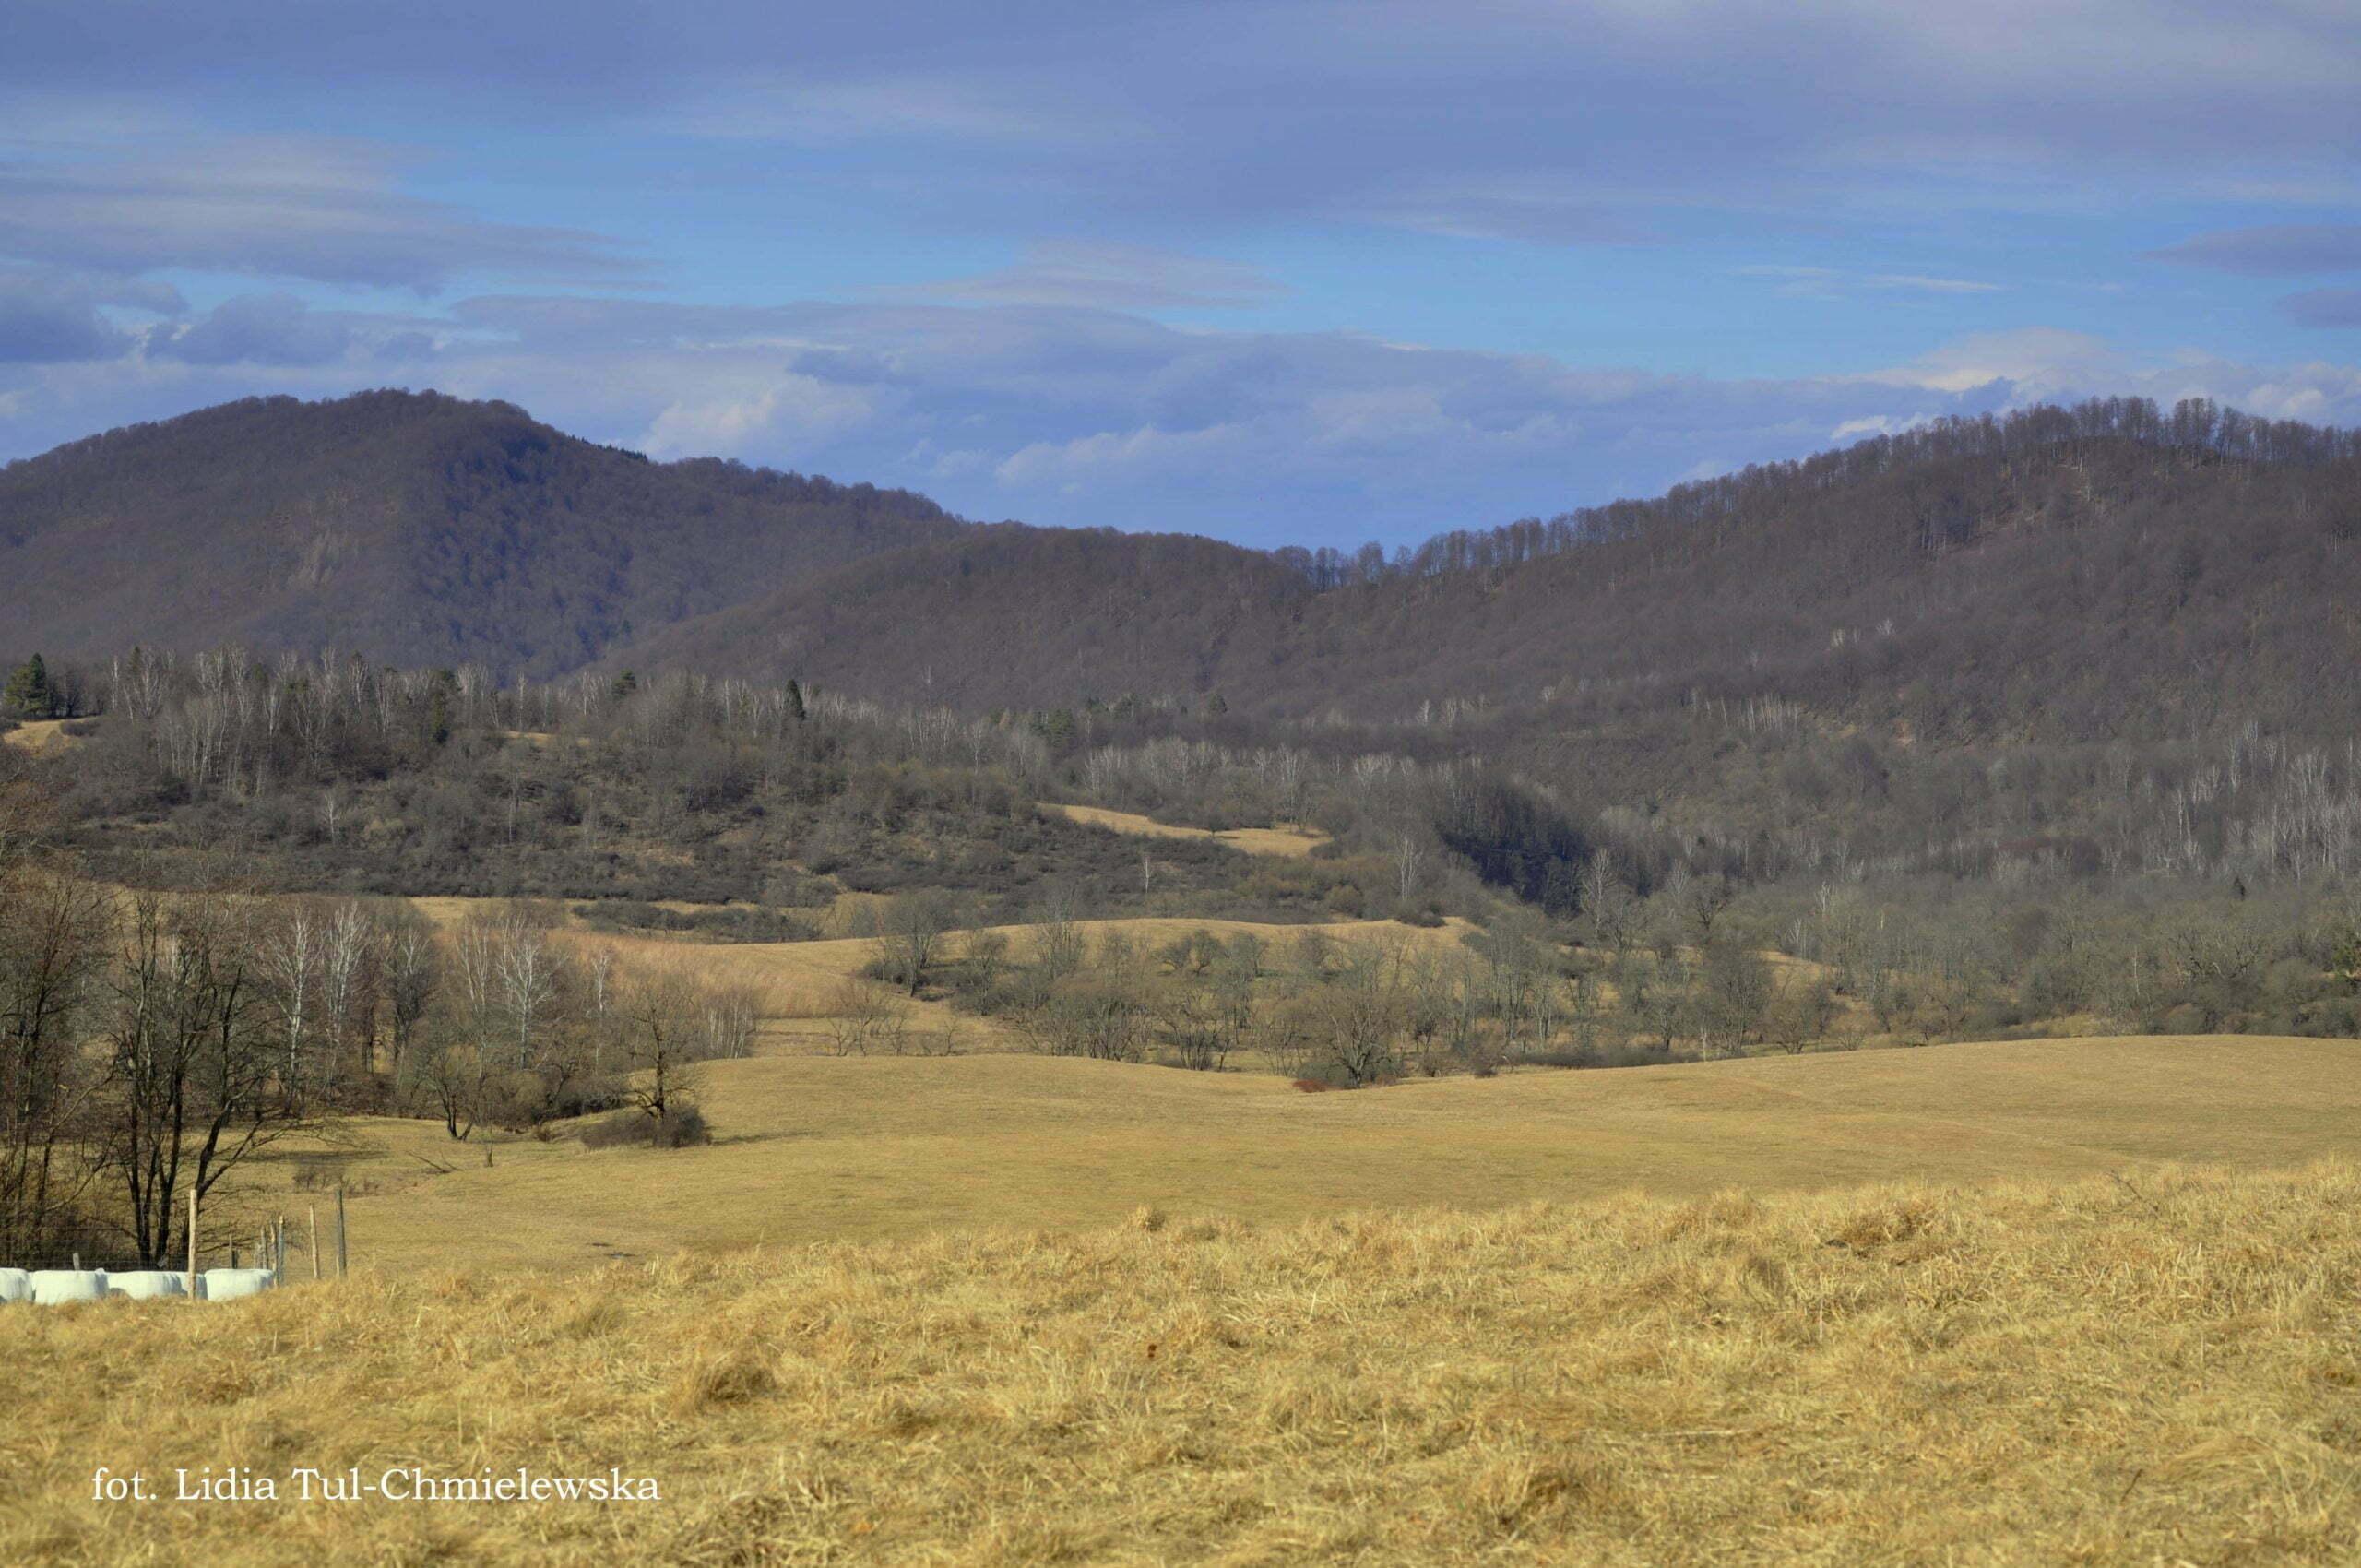 Dolina Tworylnego fot. Lidia Tul-Chmielewska